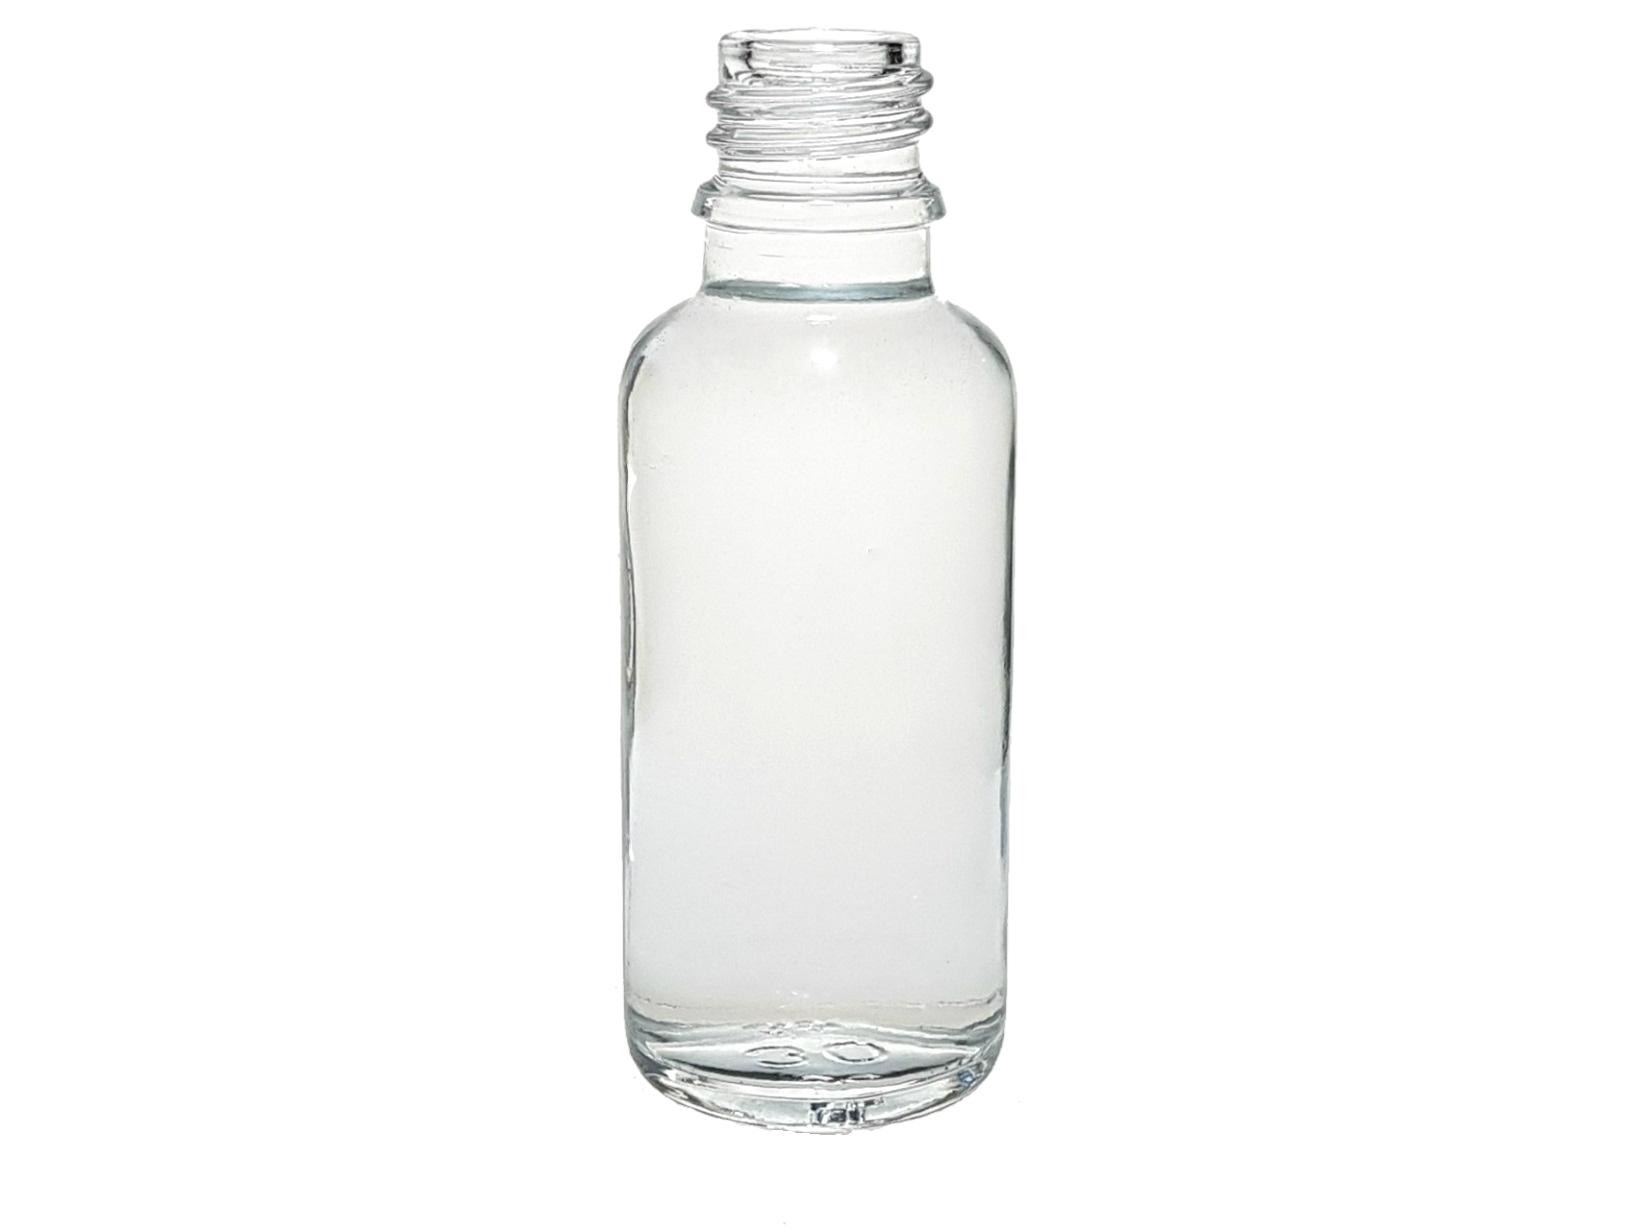 DROPPER BOTTLE 30 ML WHITE GLASS DIN 18